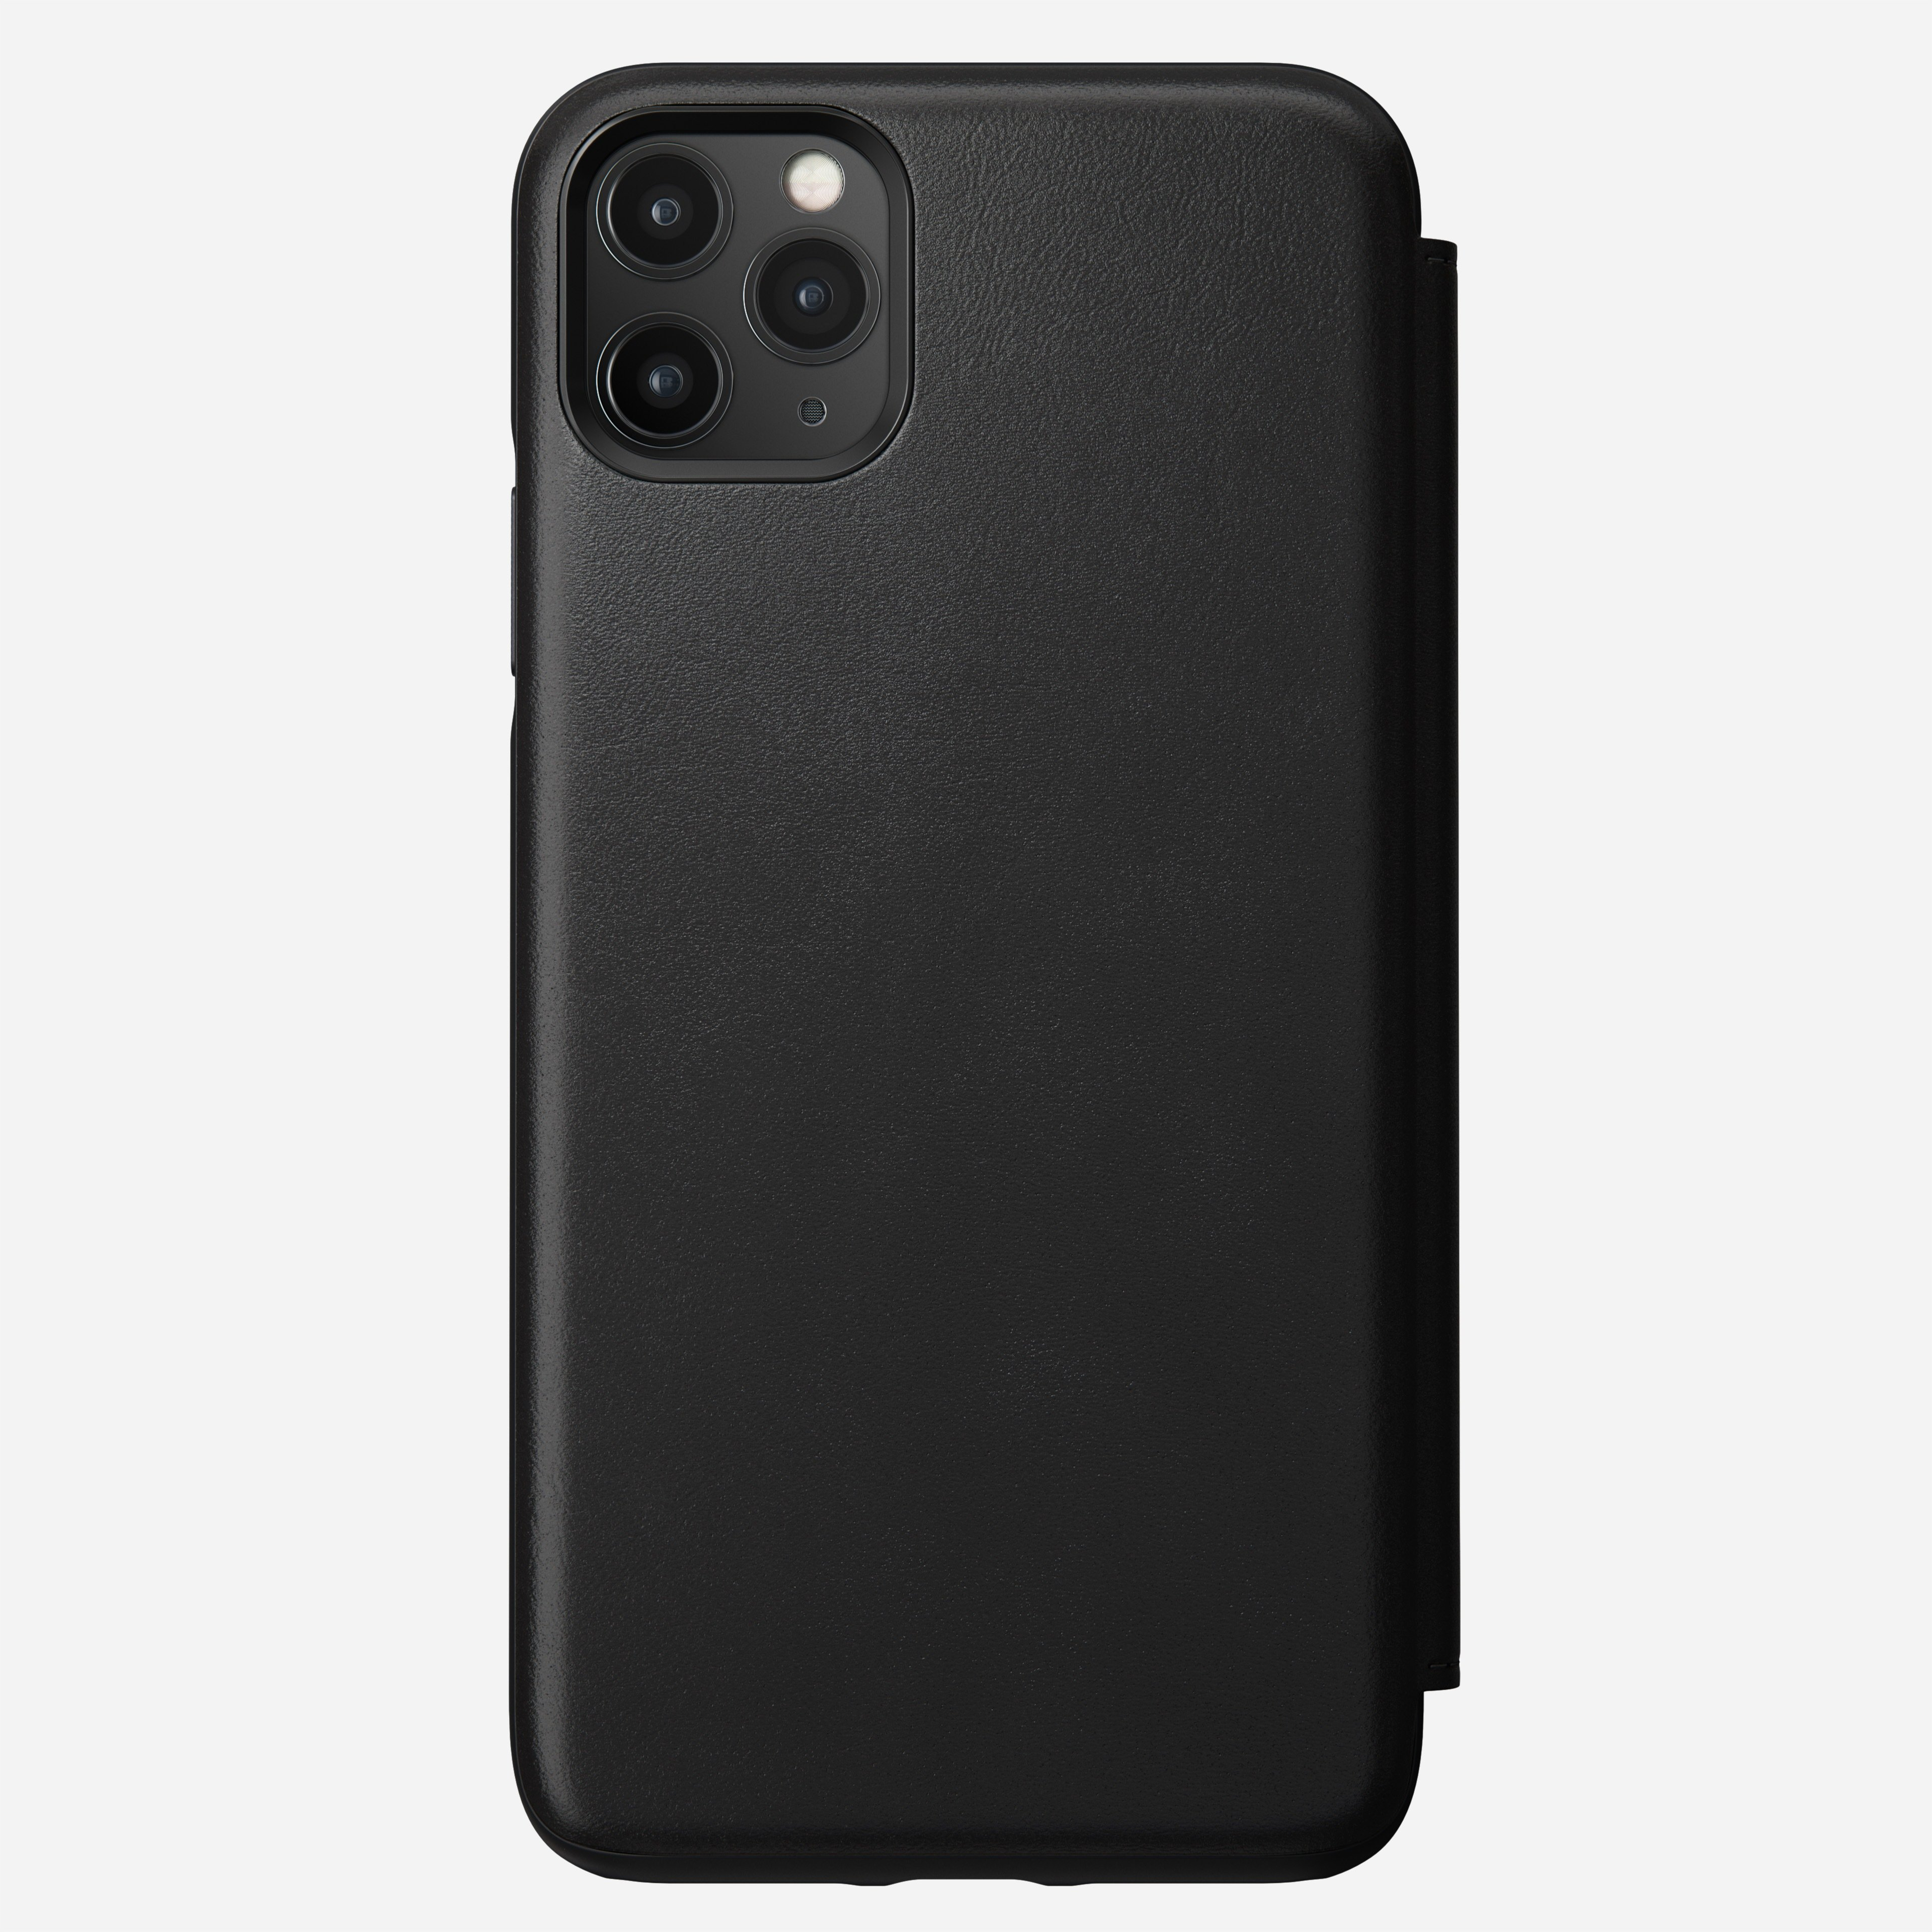 Rugged Leather Tri-Folio Case for iPhone 11 Pro Max, Black